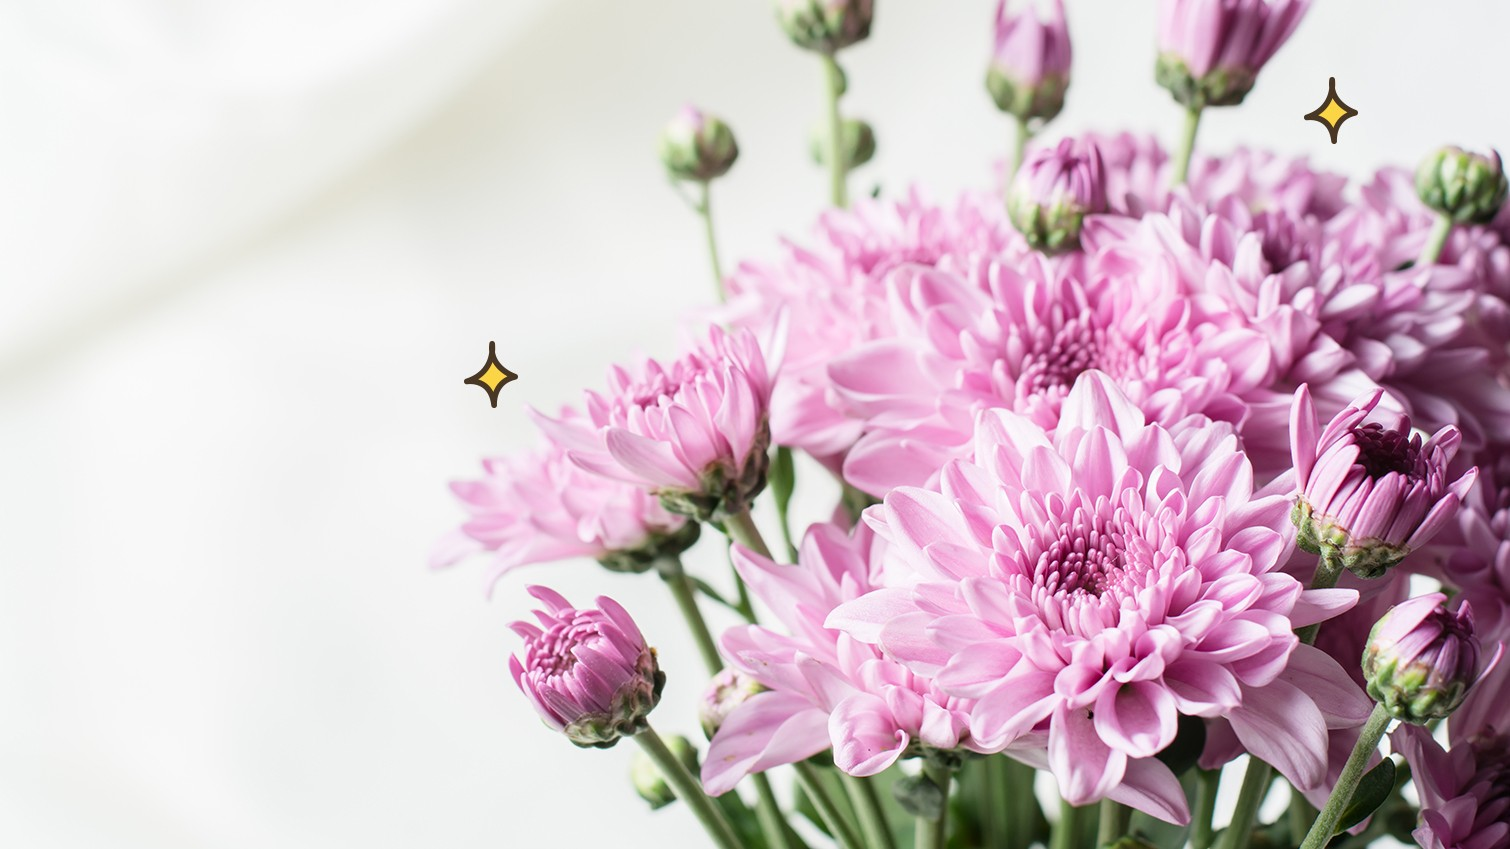 Download 5800 Koleksi Gambar Bunga Krisan Paling Cantik HD